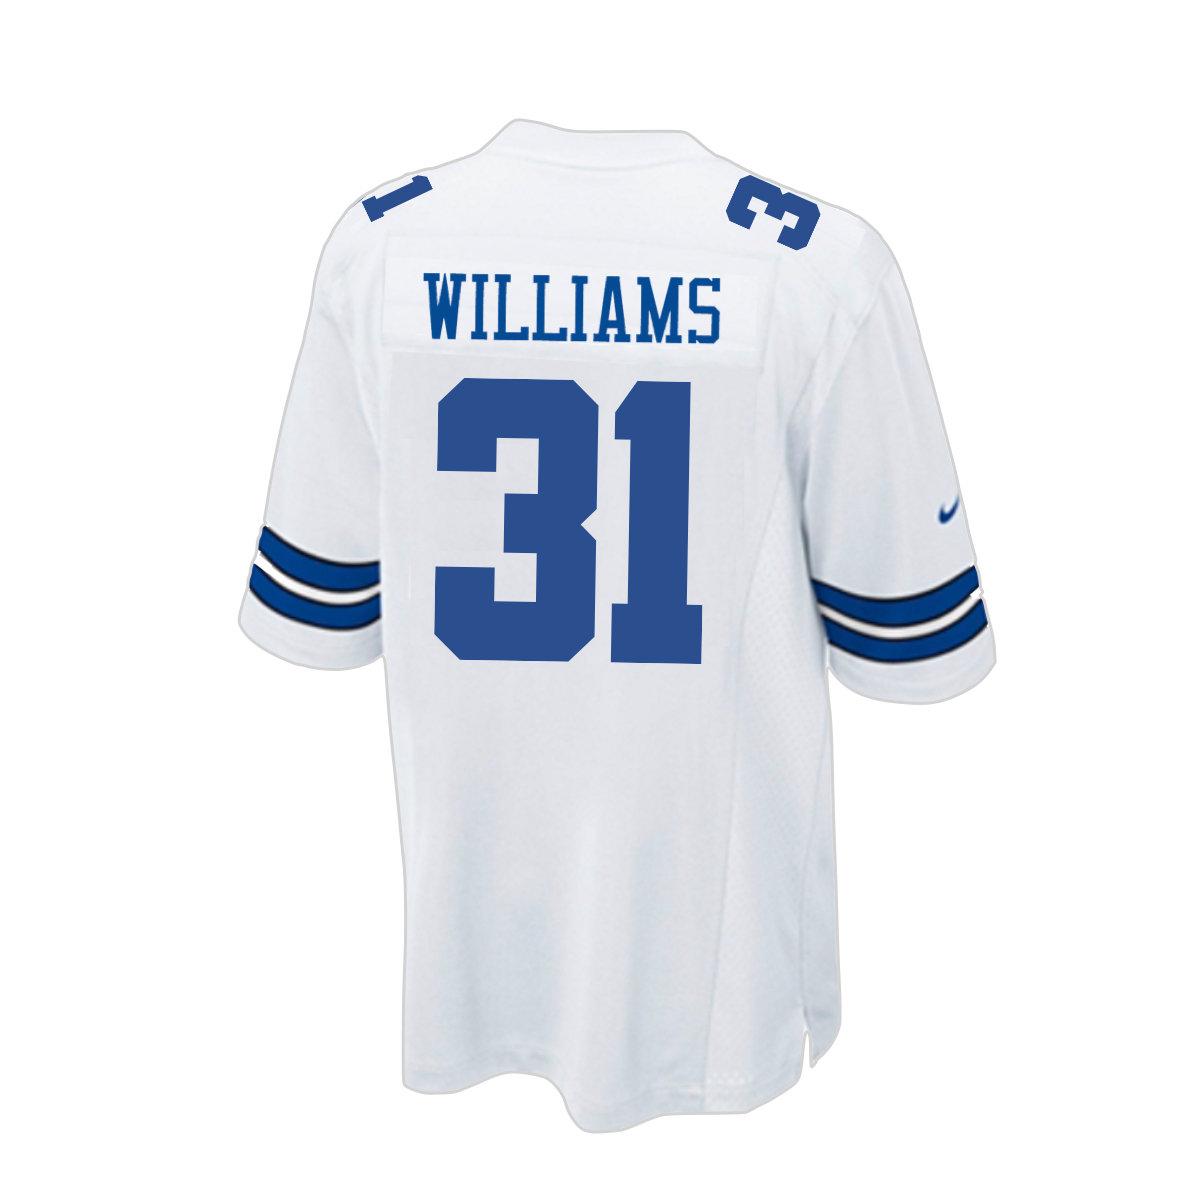 roy williams jersey